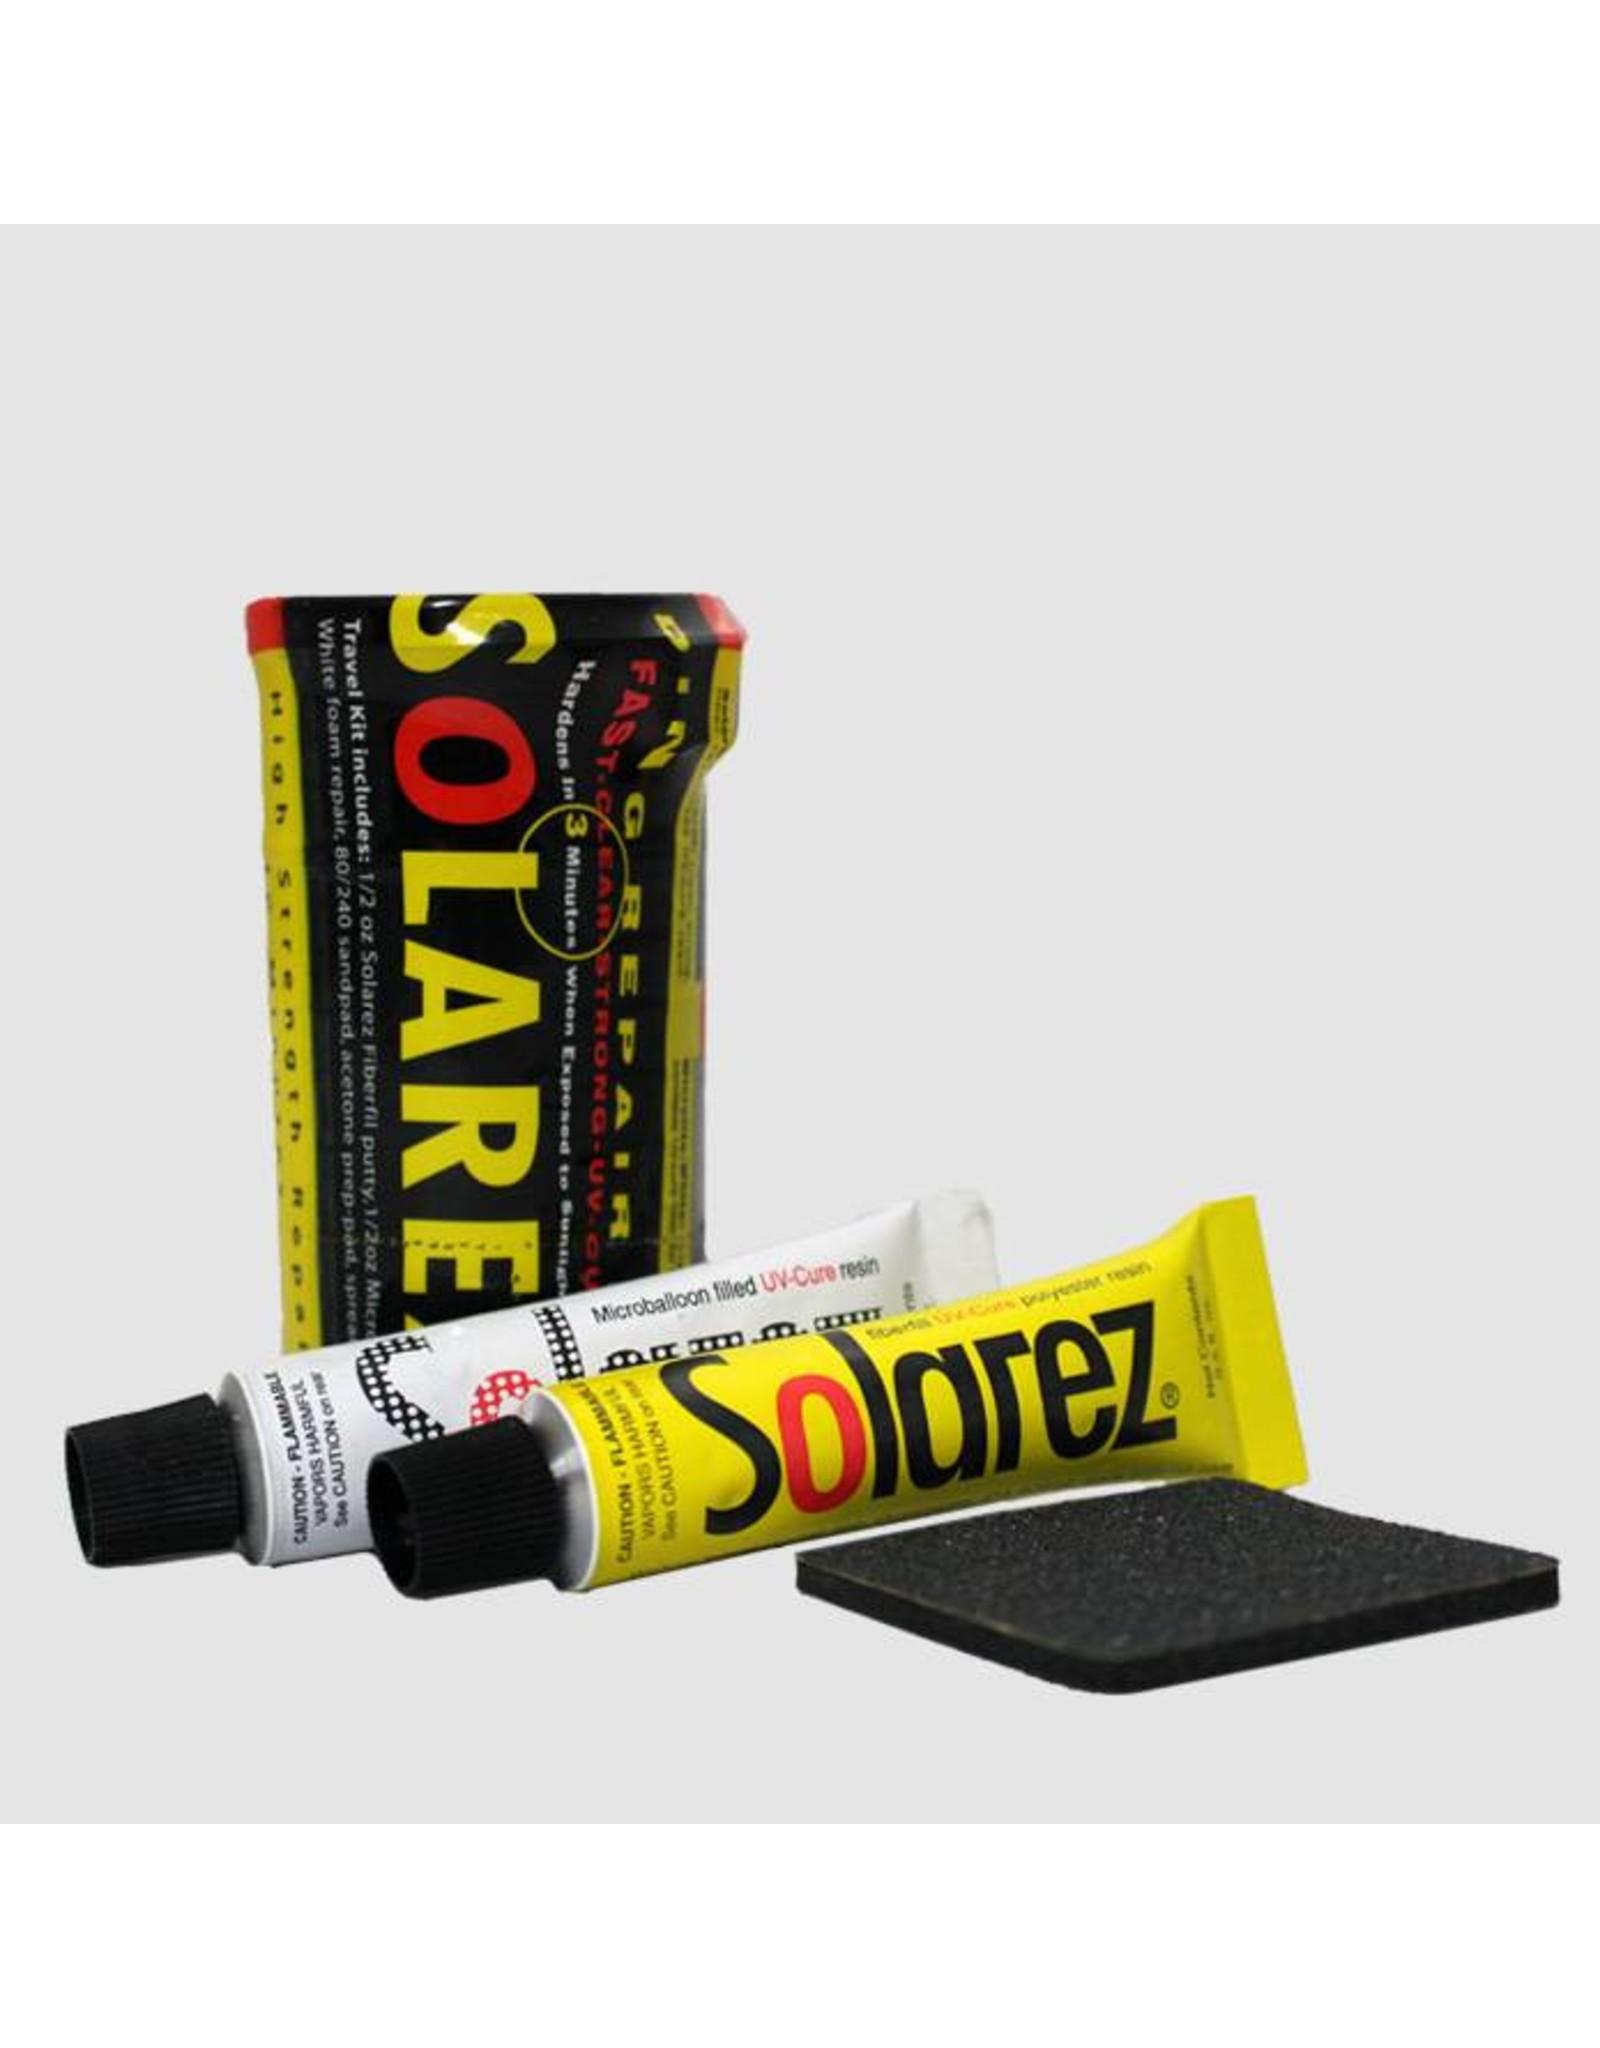 Solarez Solarez Travel Kit Repair UV Mini